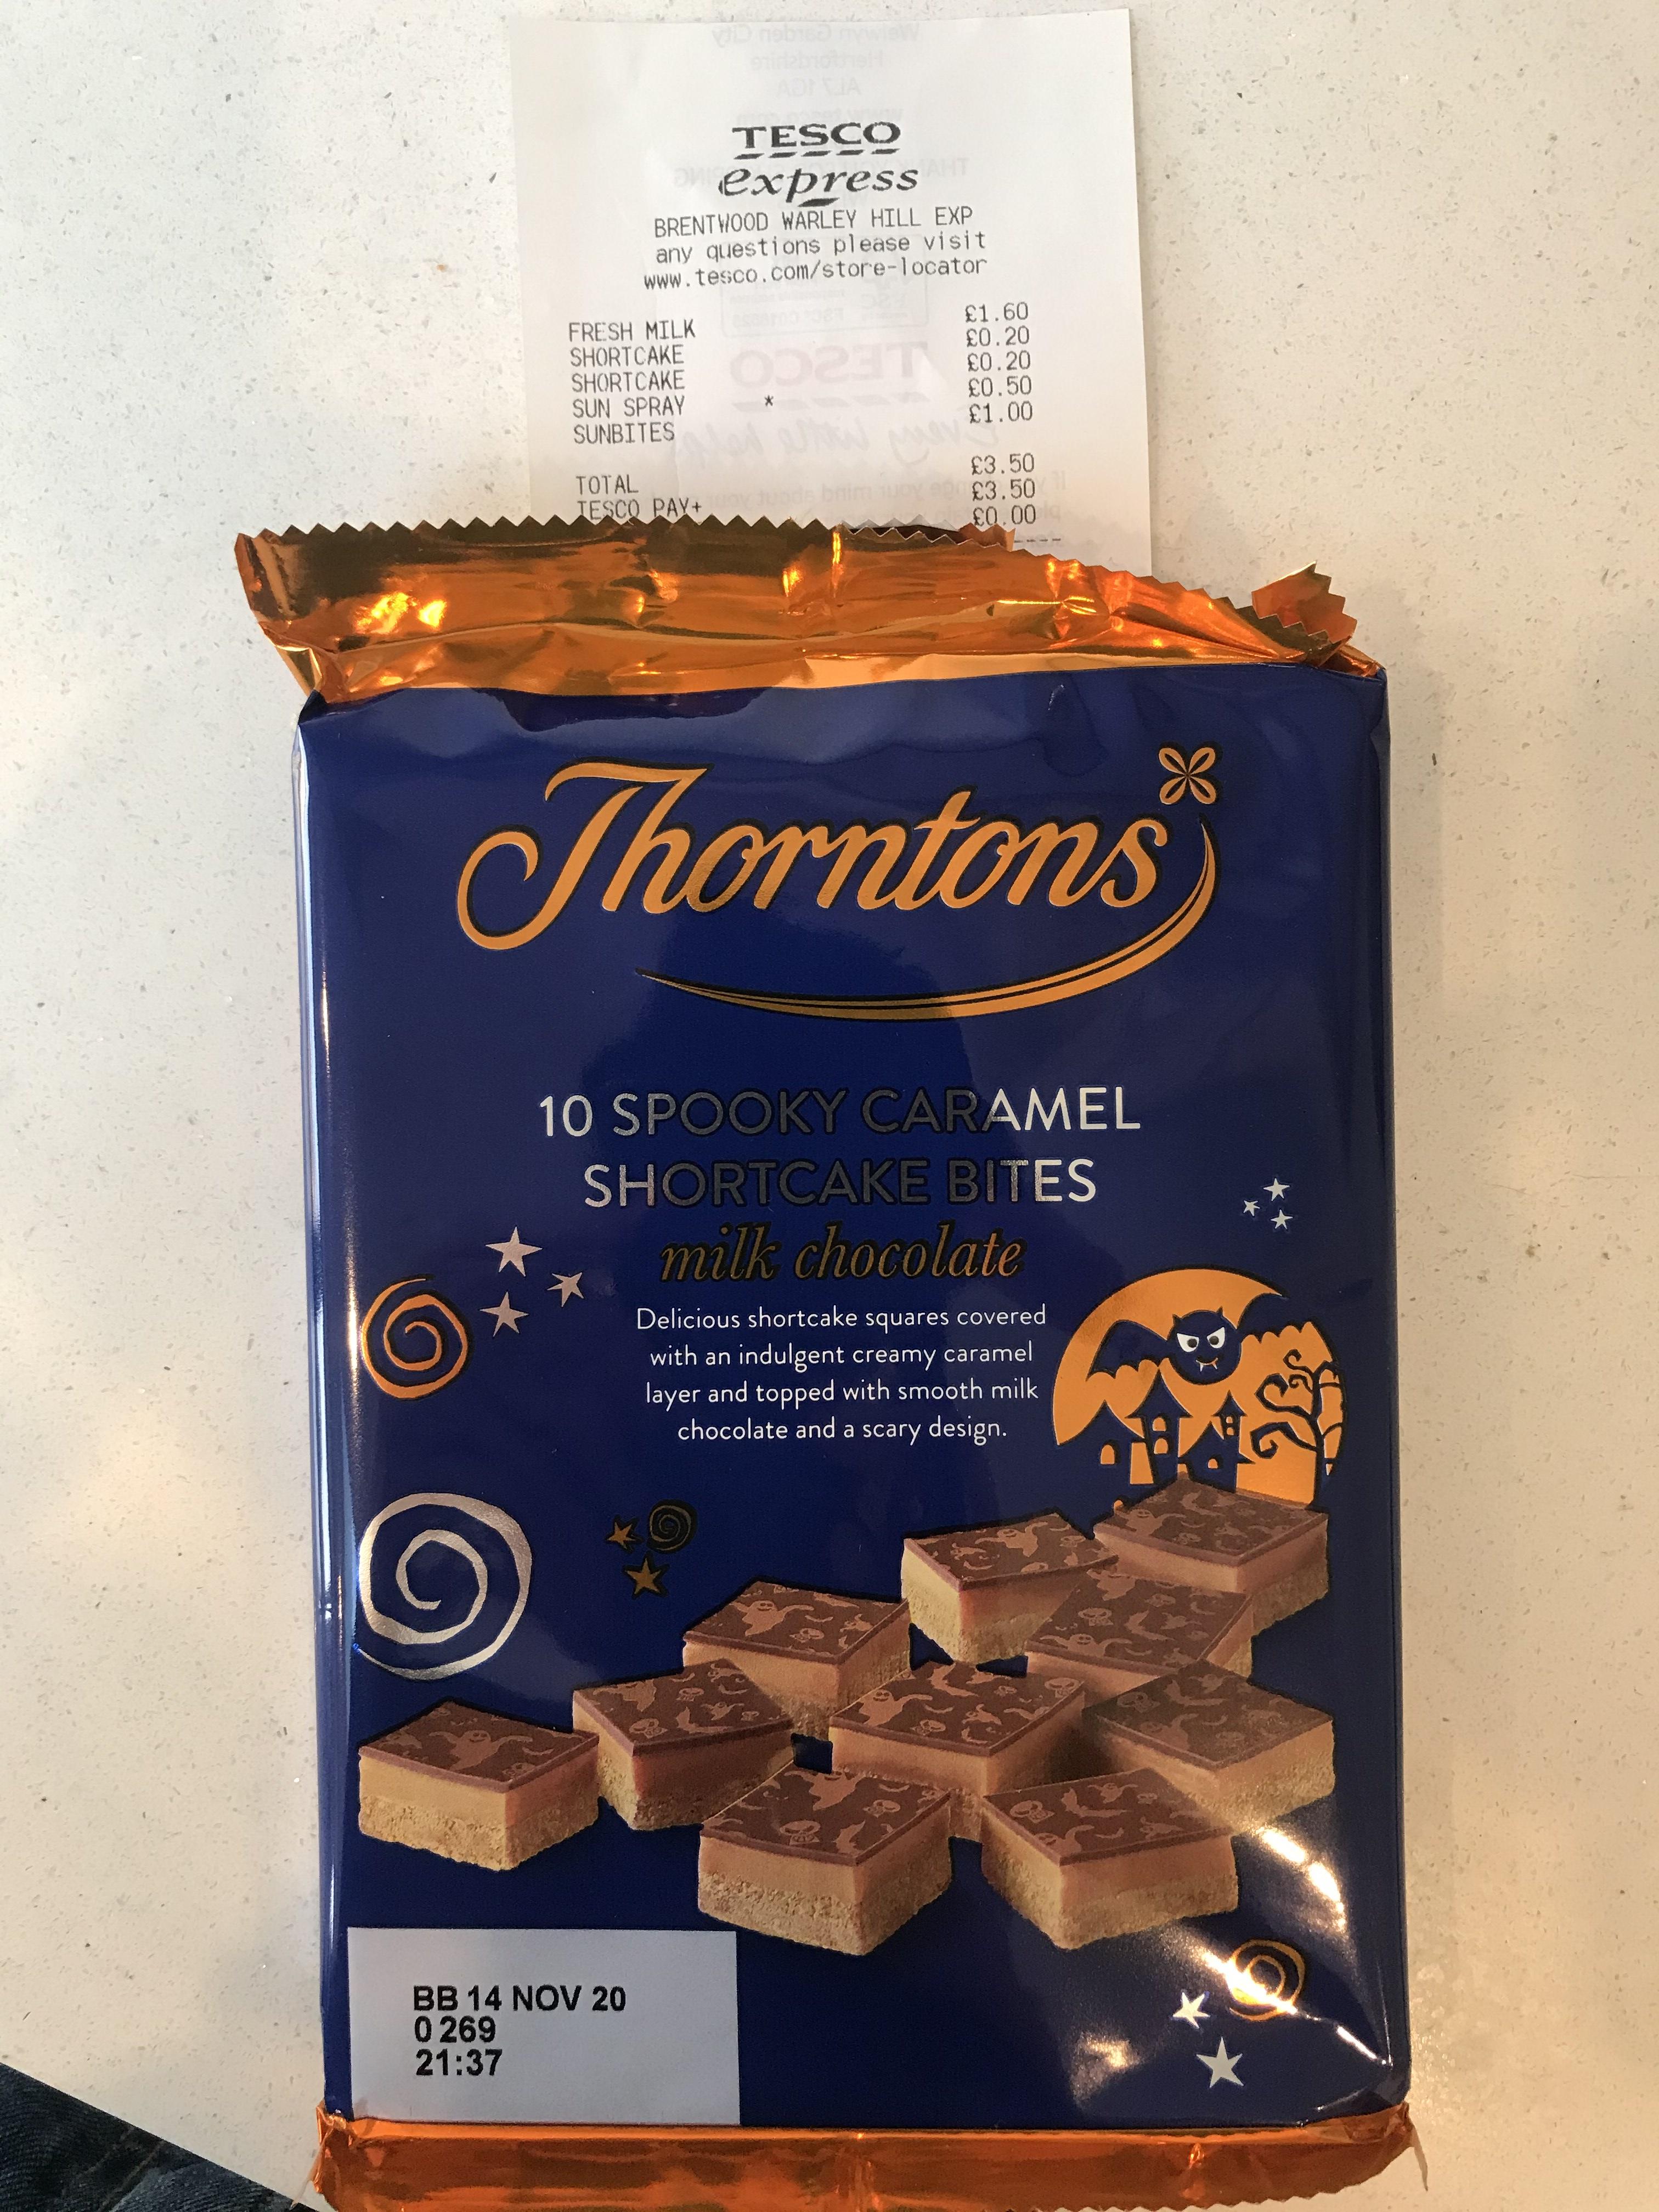 Thorntons halloween chocolate shortbread 20p @ Tesco (Brentwood)